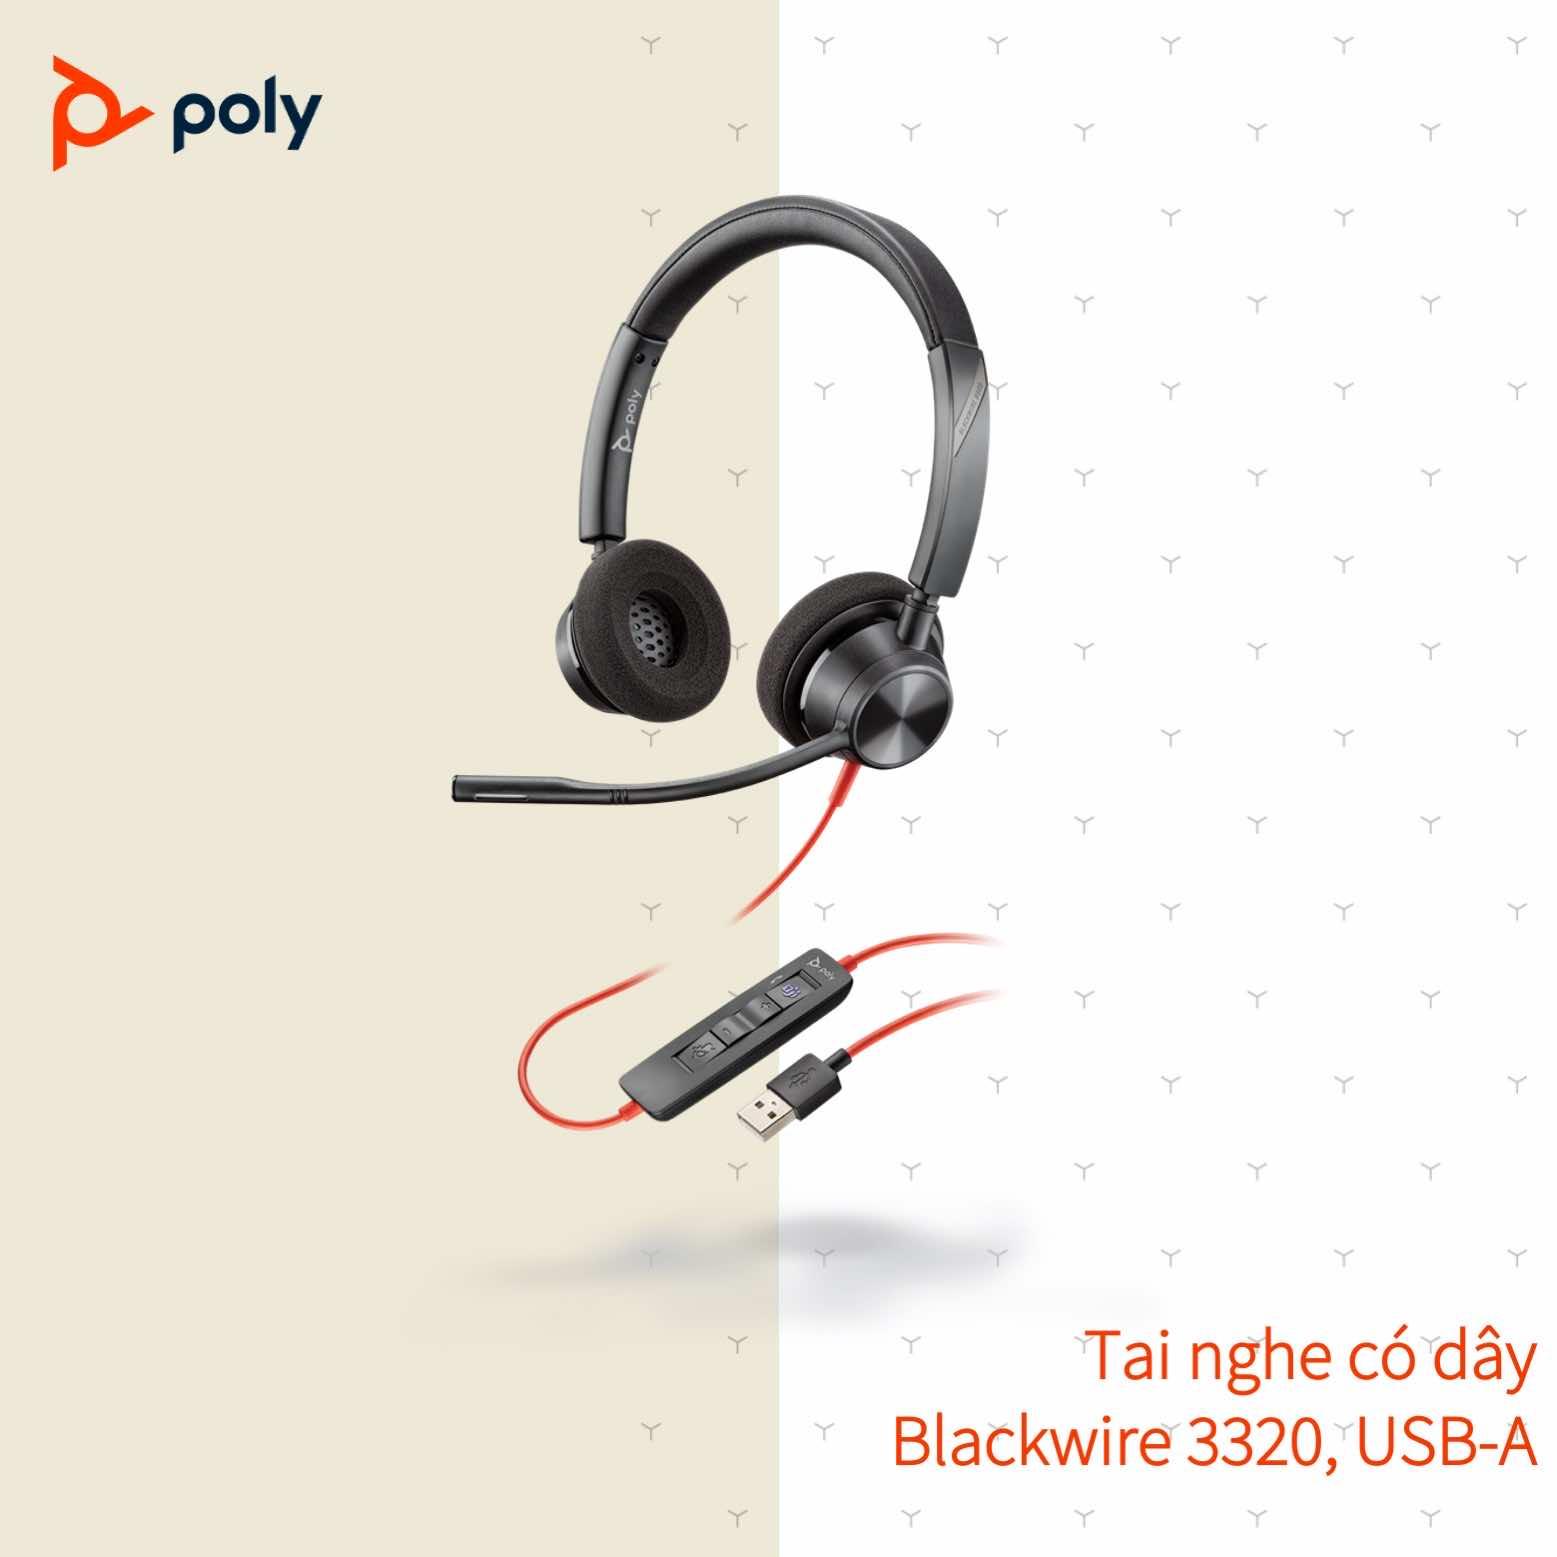 Review tai nghe có dây Poly Plantronics Blackwire 3320 USB Type A/C